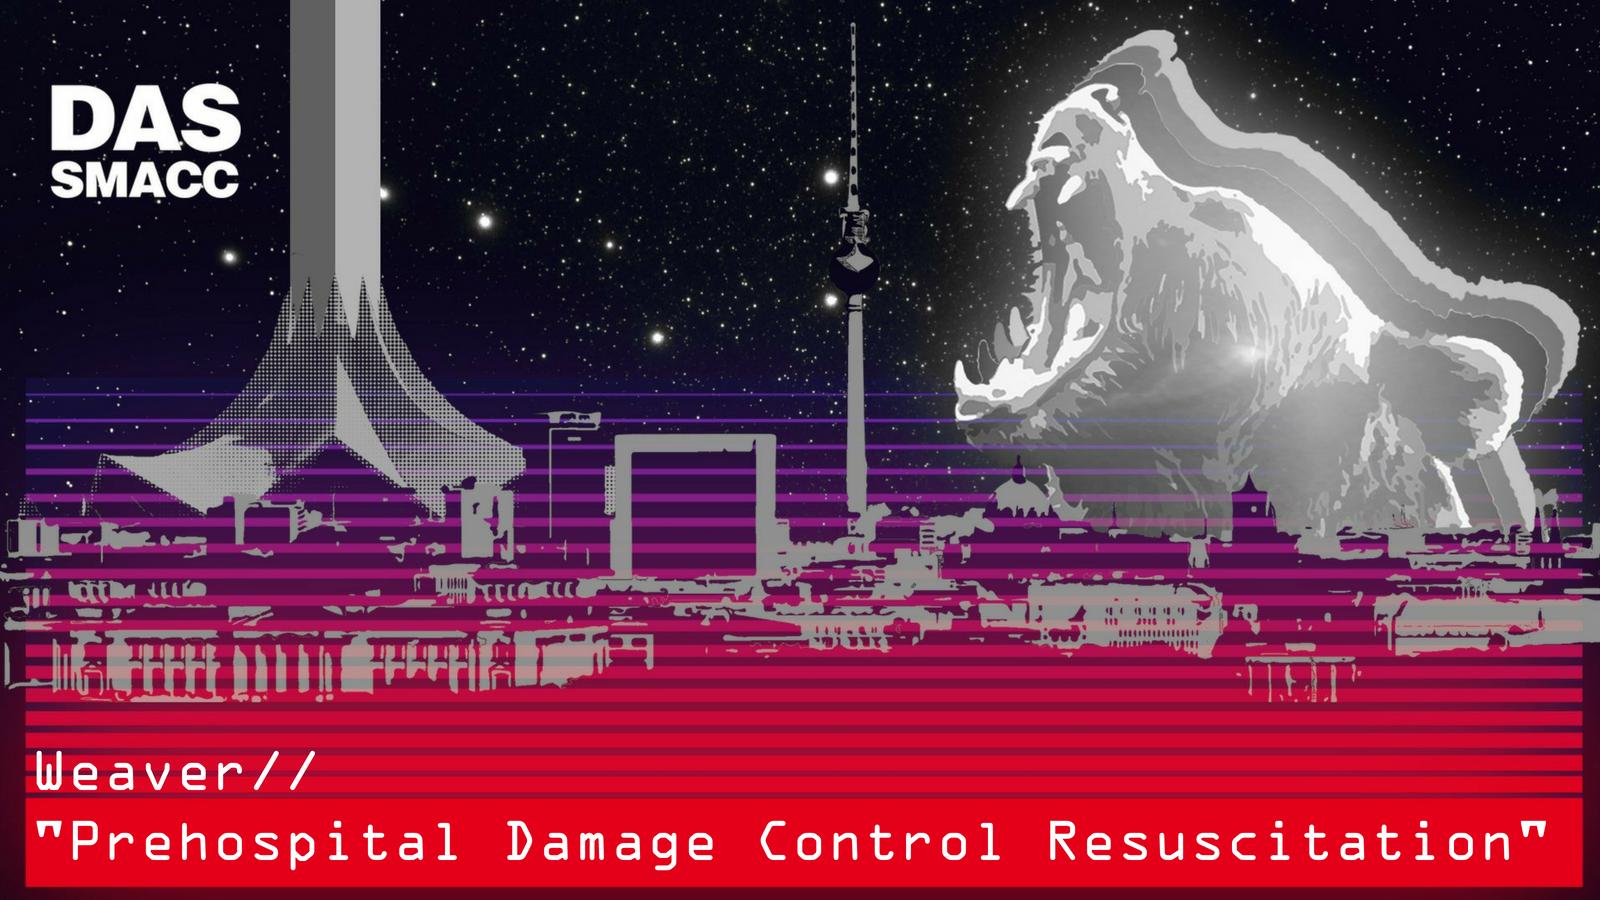 Prehospital Damage Control Resuscitation for Shock and Massive Haemorrhage